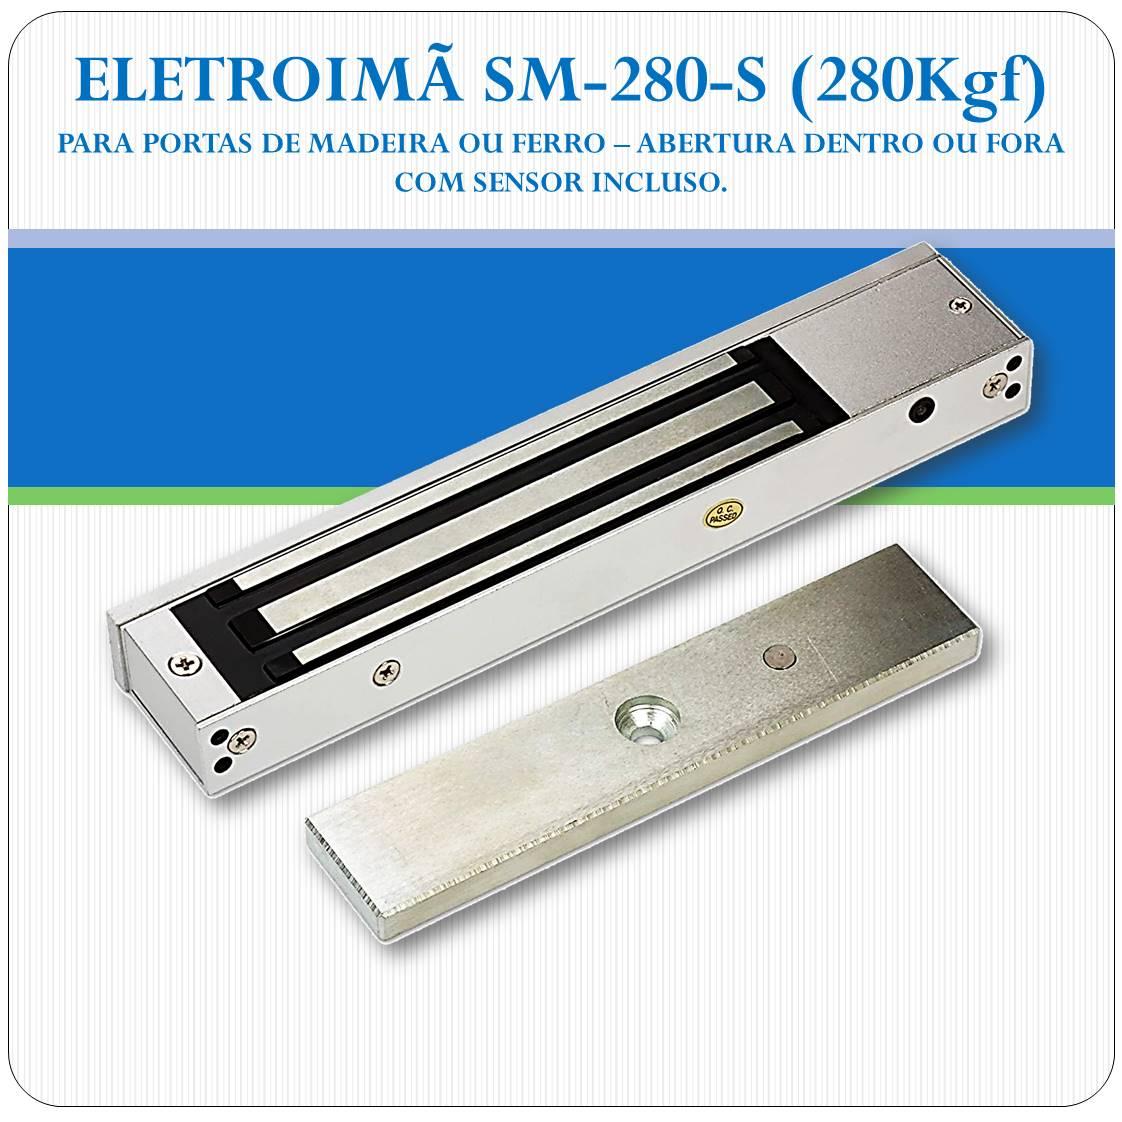 Eletroimã SM-280 - 280Kgf